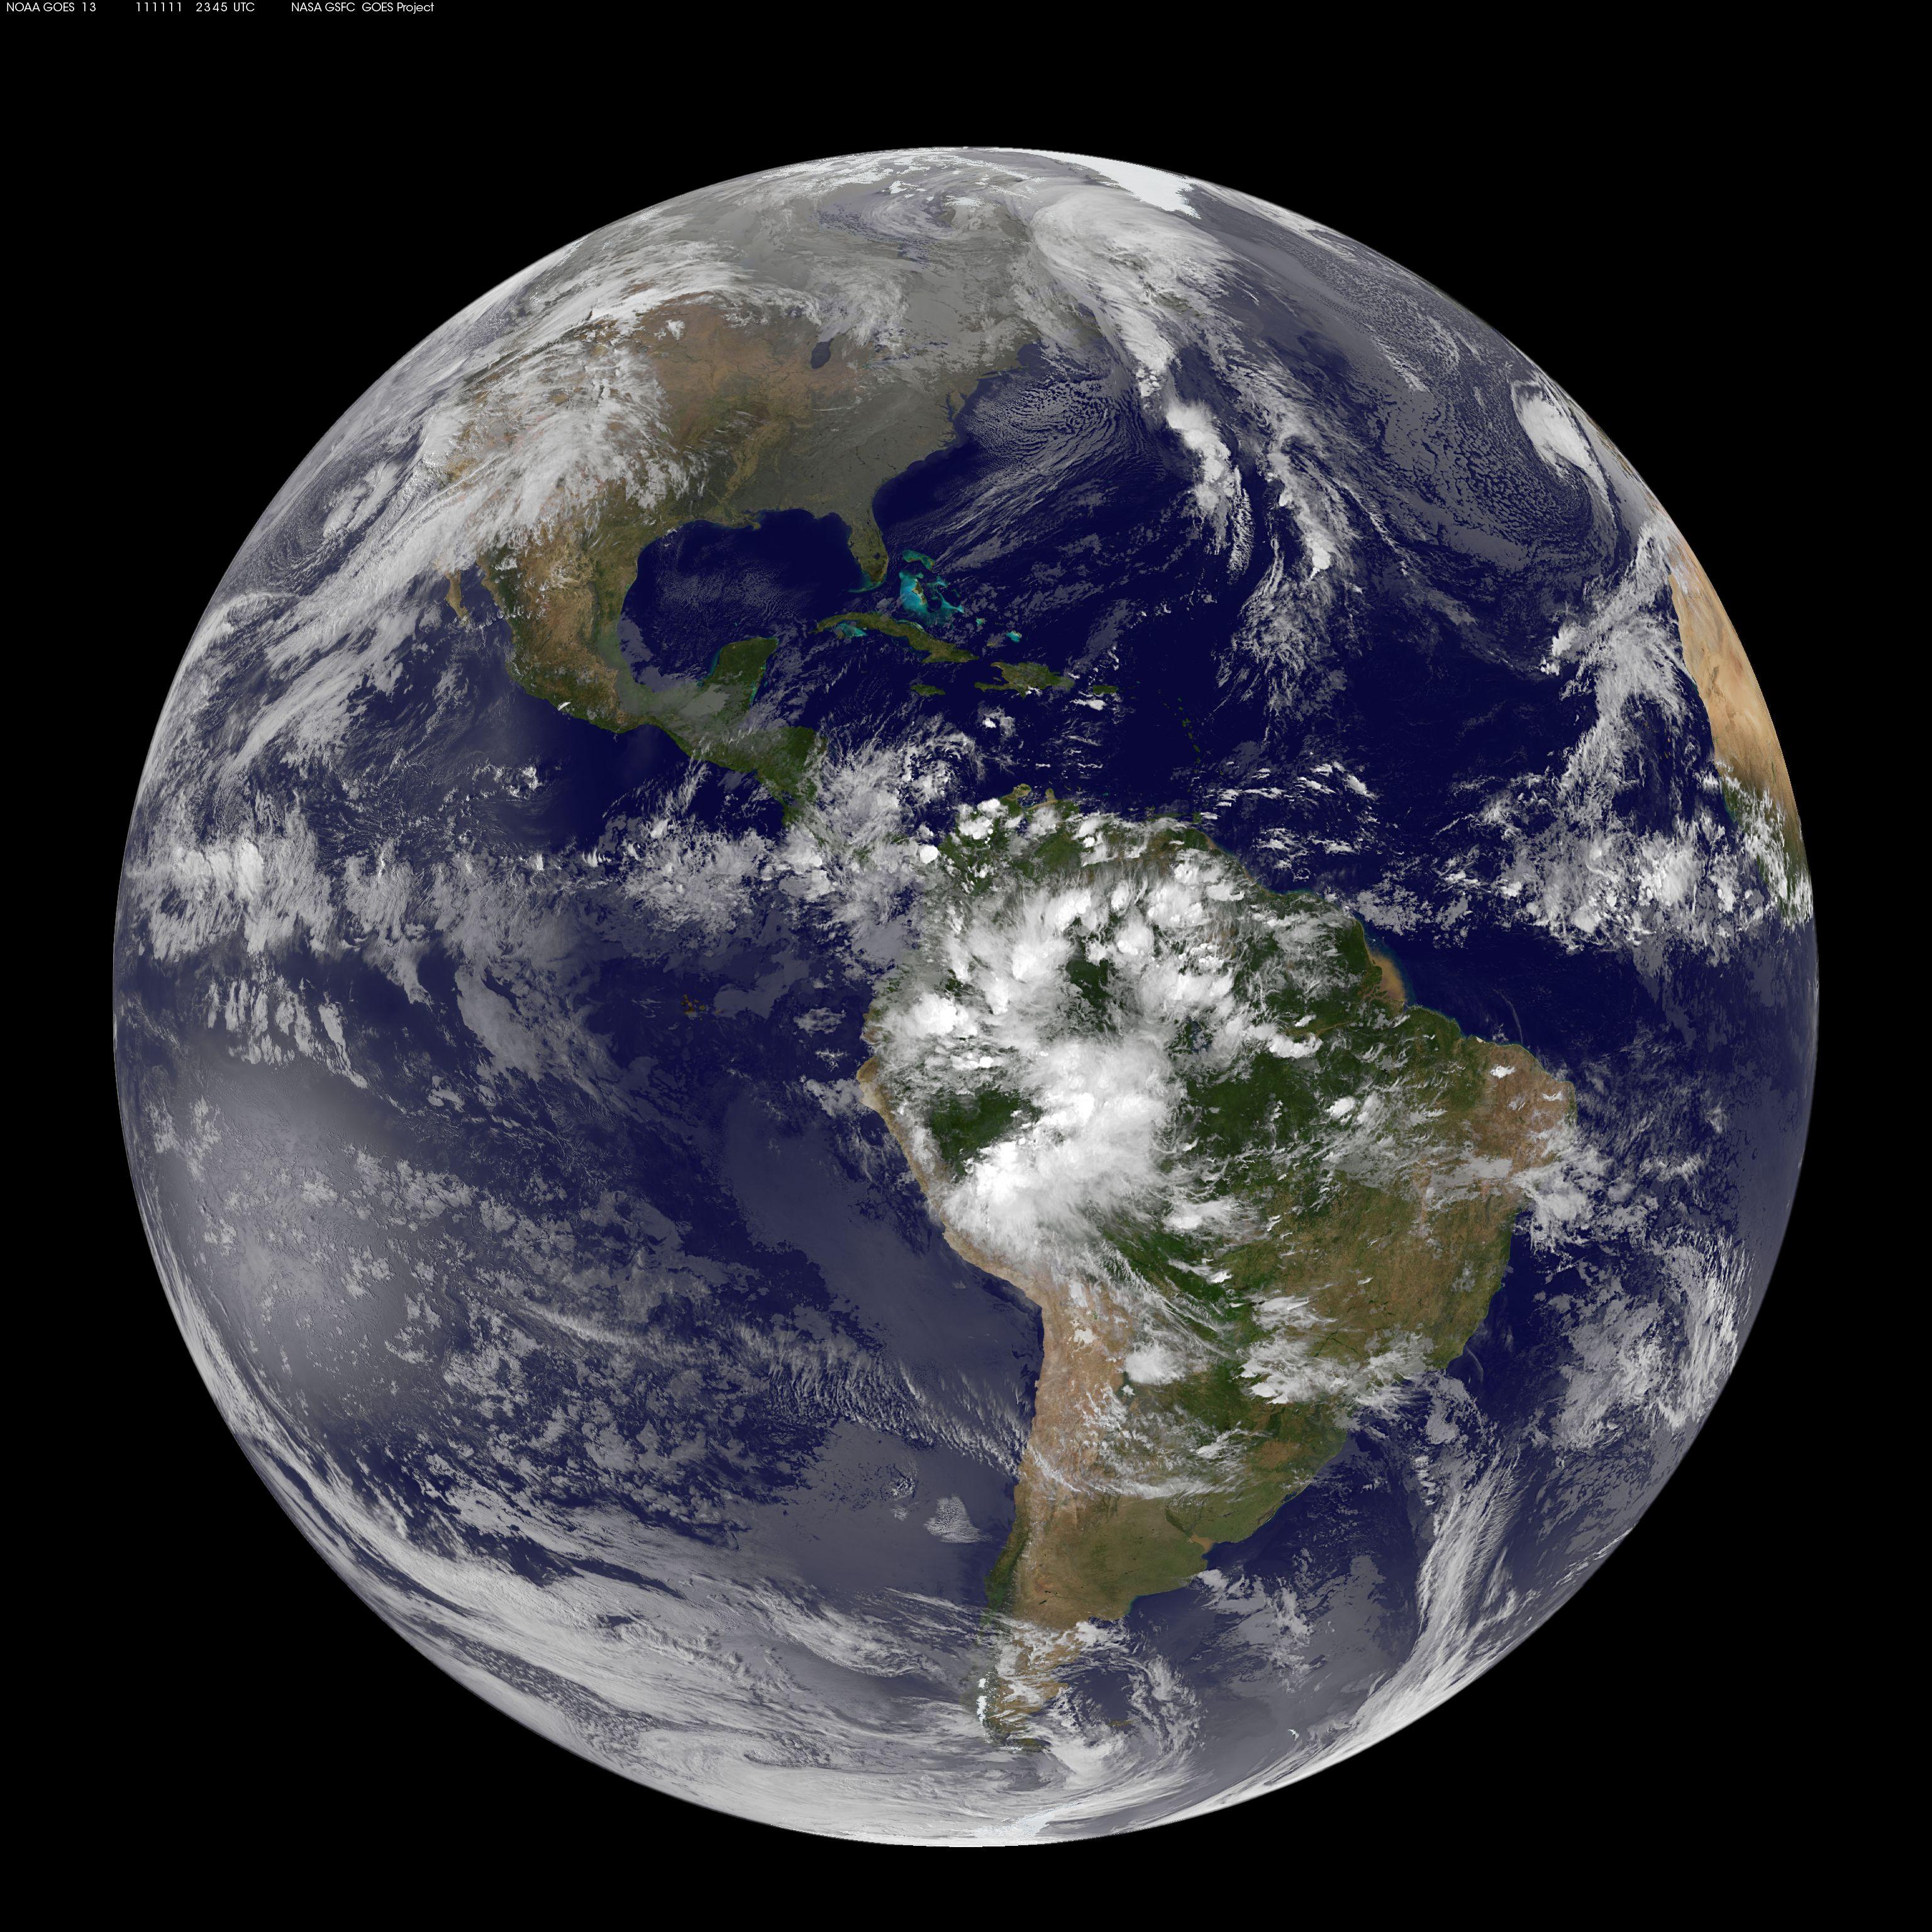 FileSatellite View Of Earth On Jpg - Earth satellite view 2016